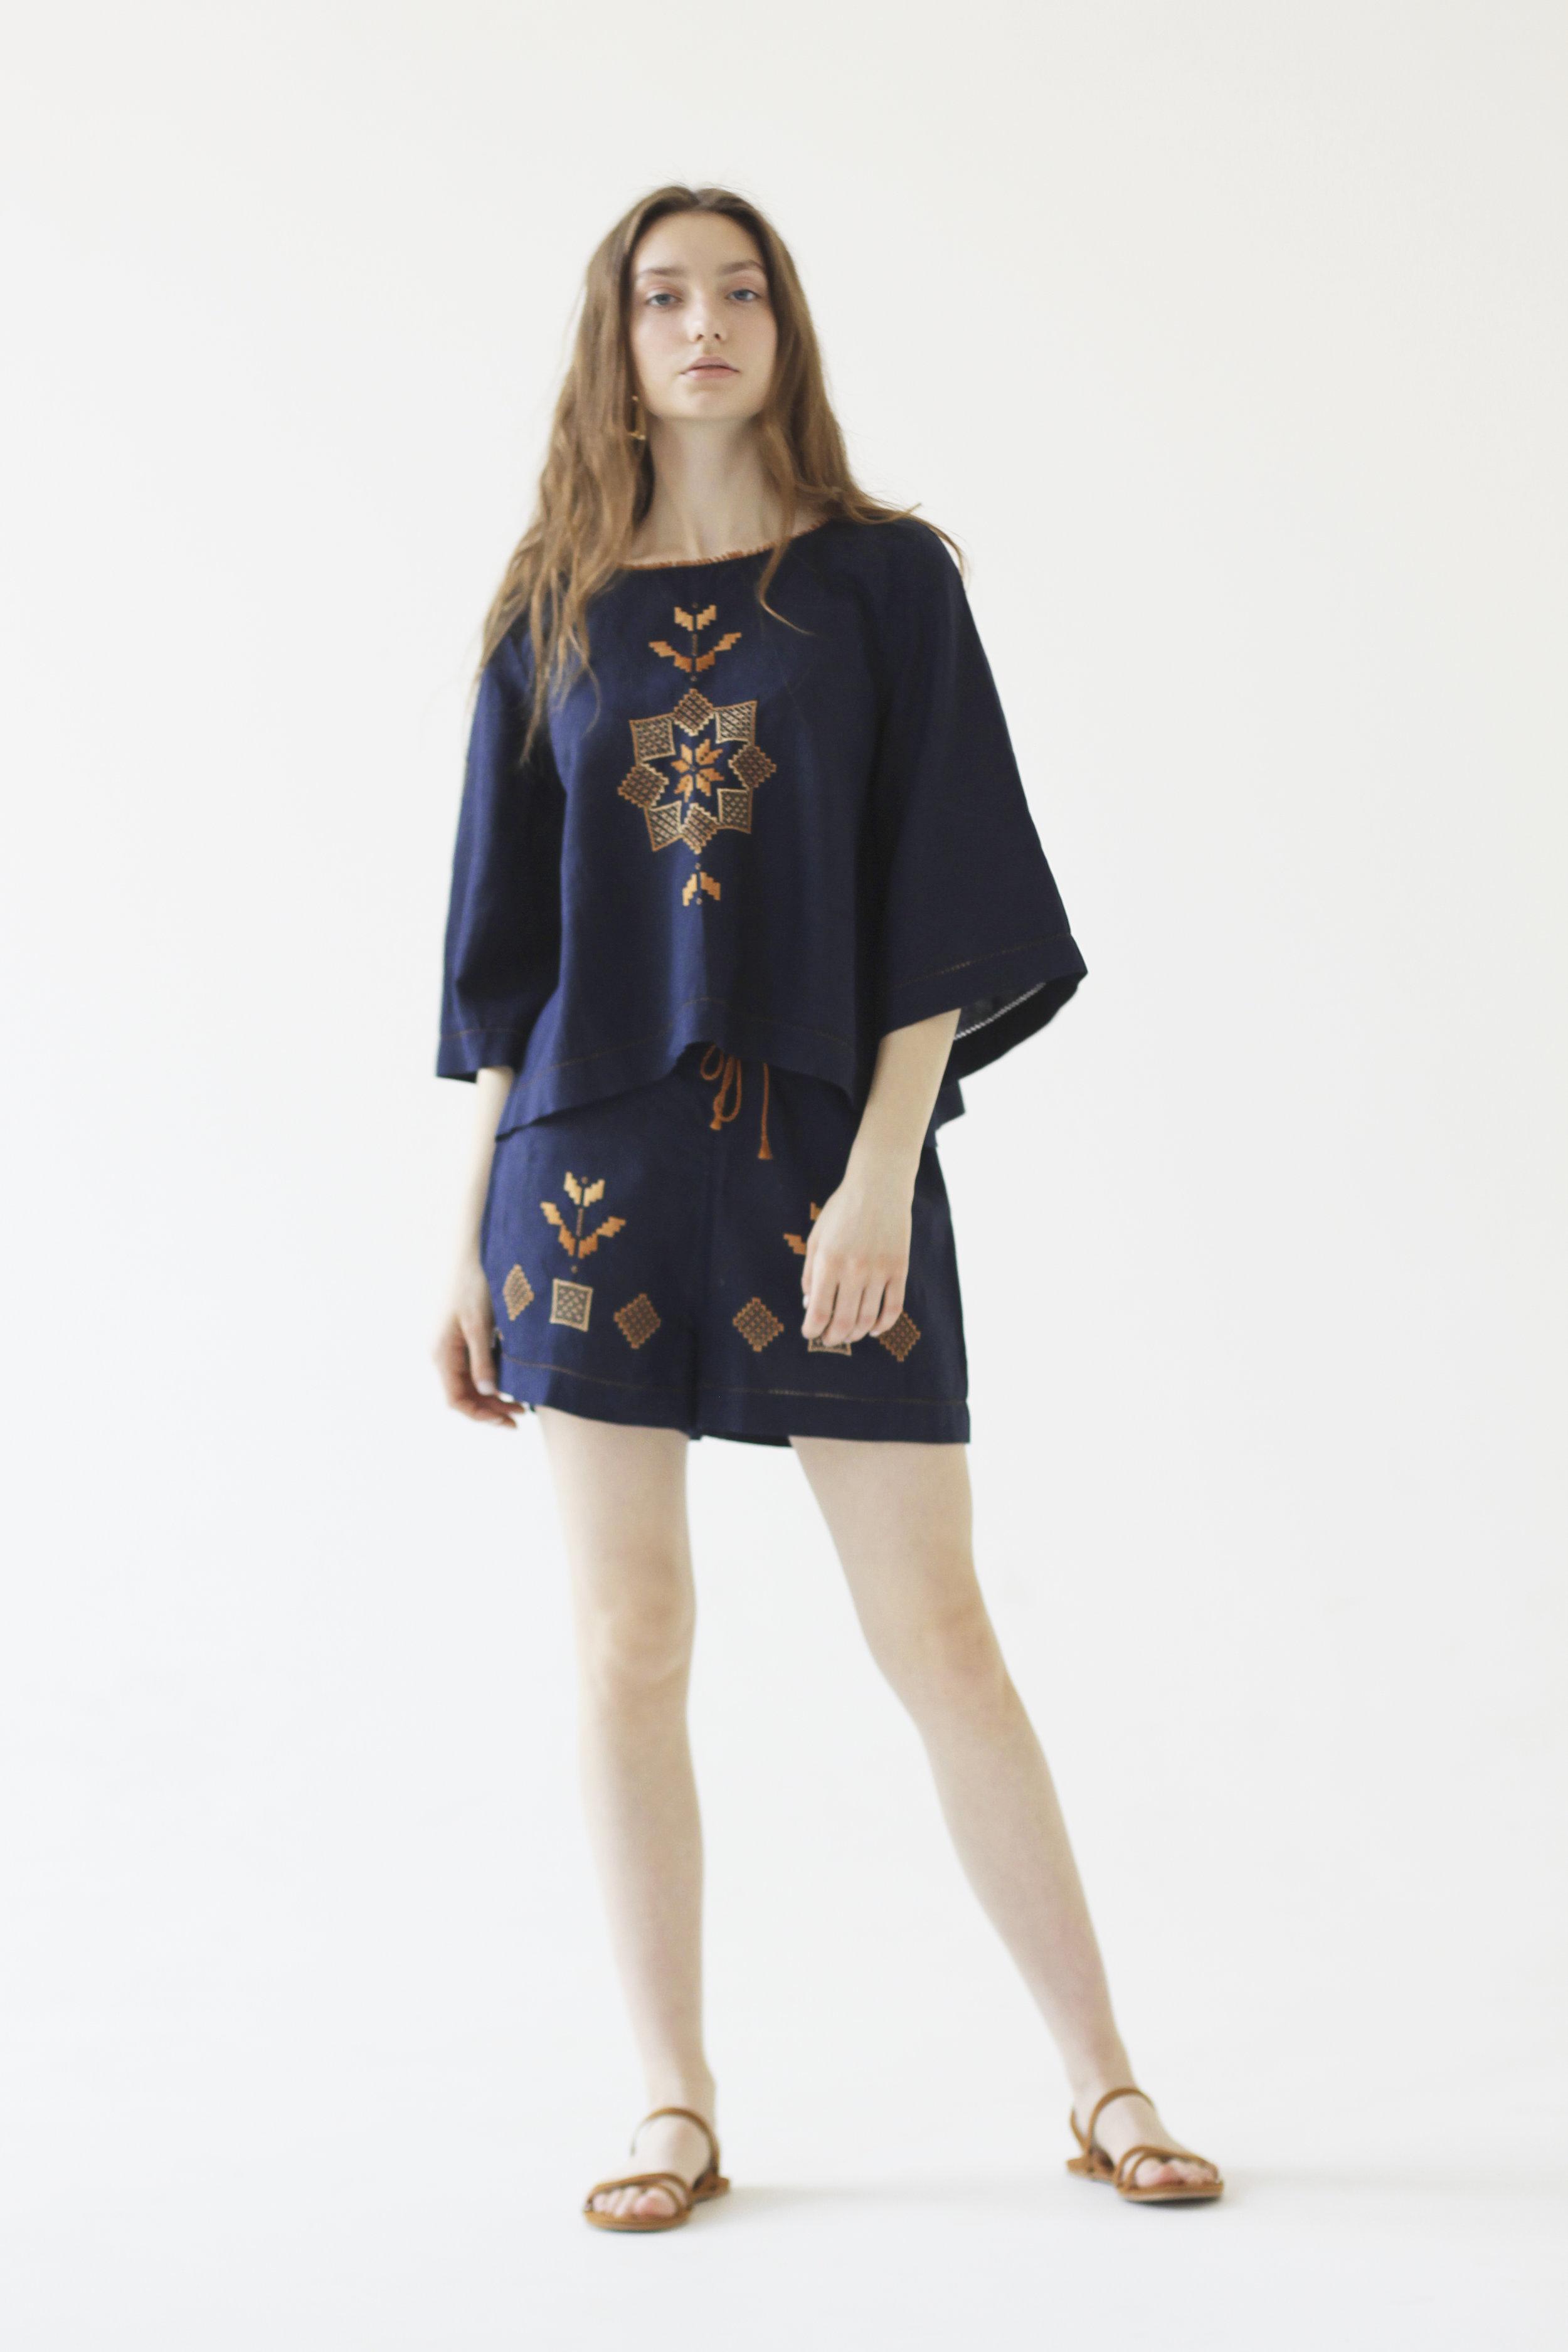 Araks Top + Shorts Gold on Blue.jpg